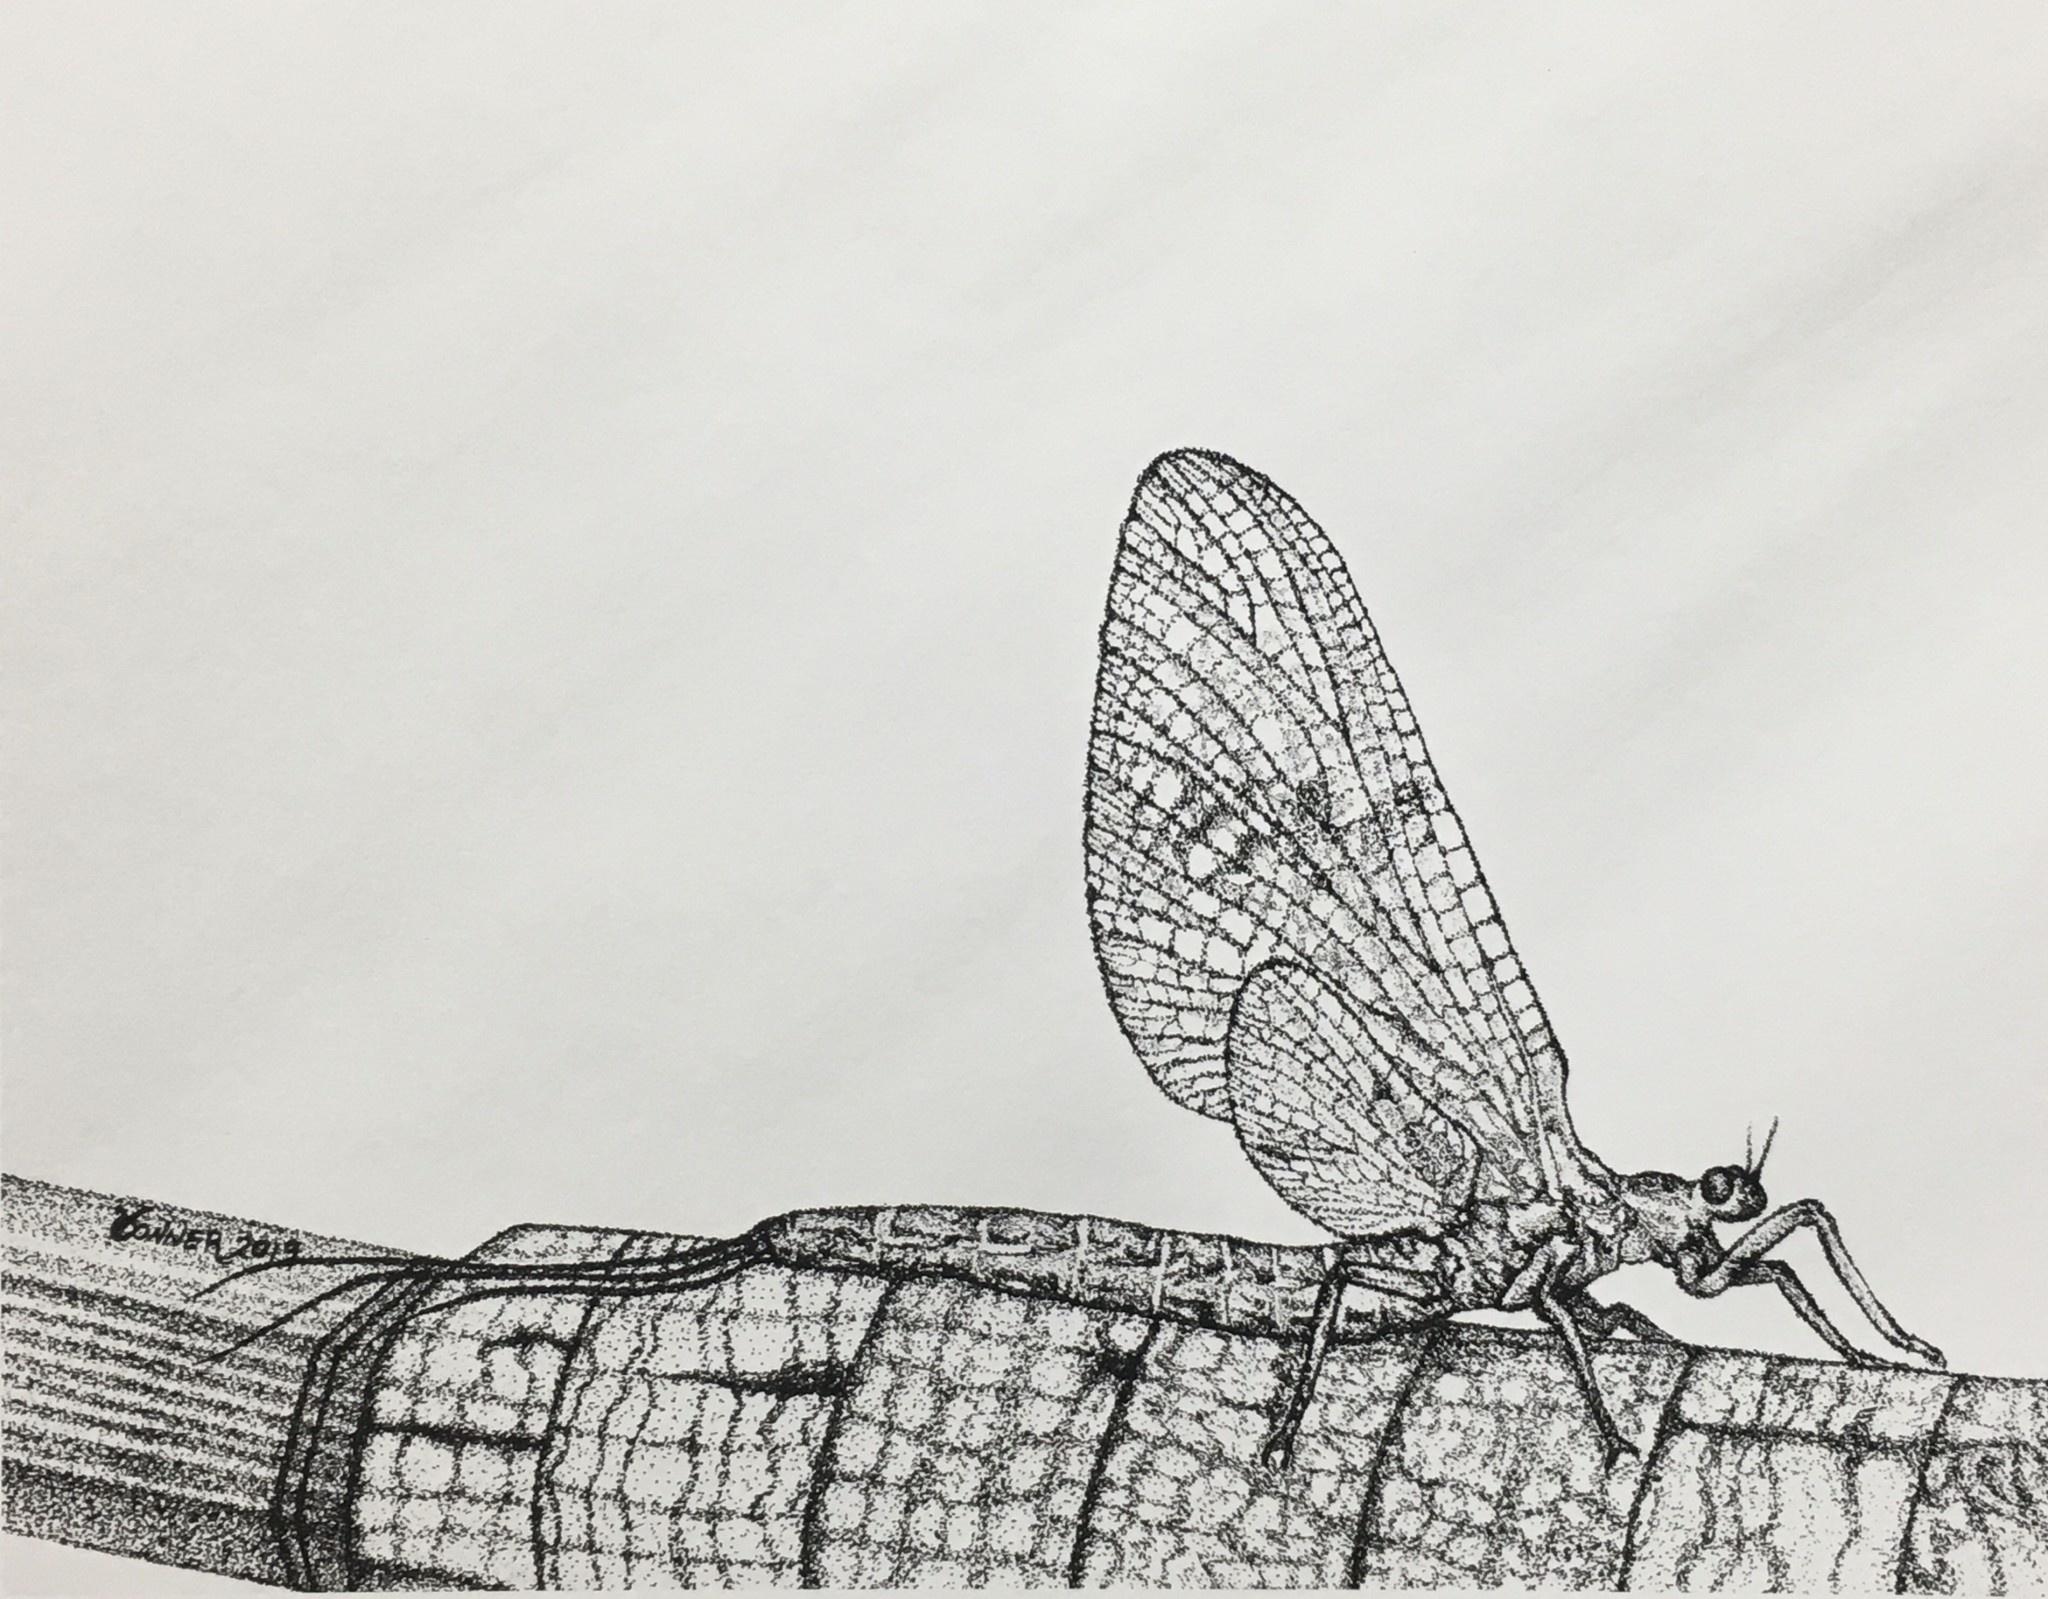 Conner Art - Ephemeroptera Print